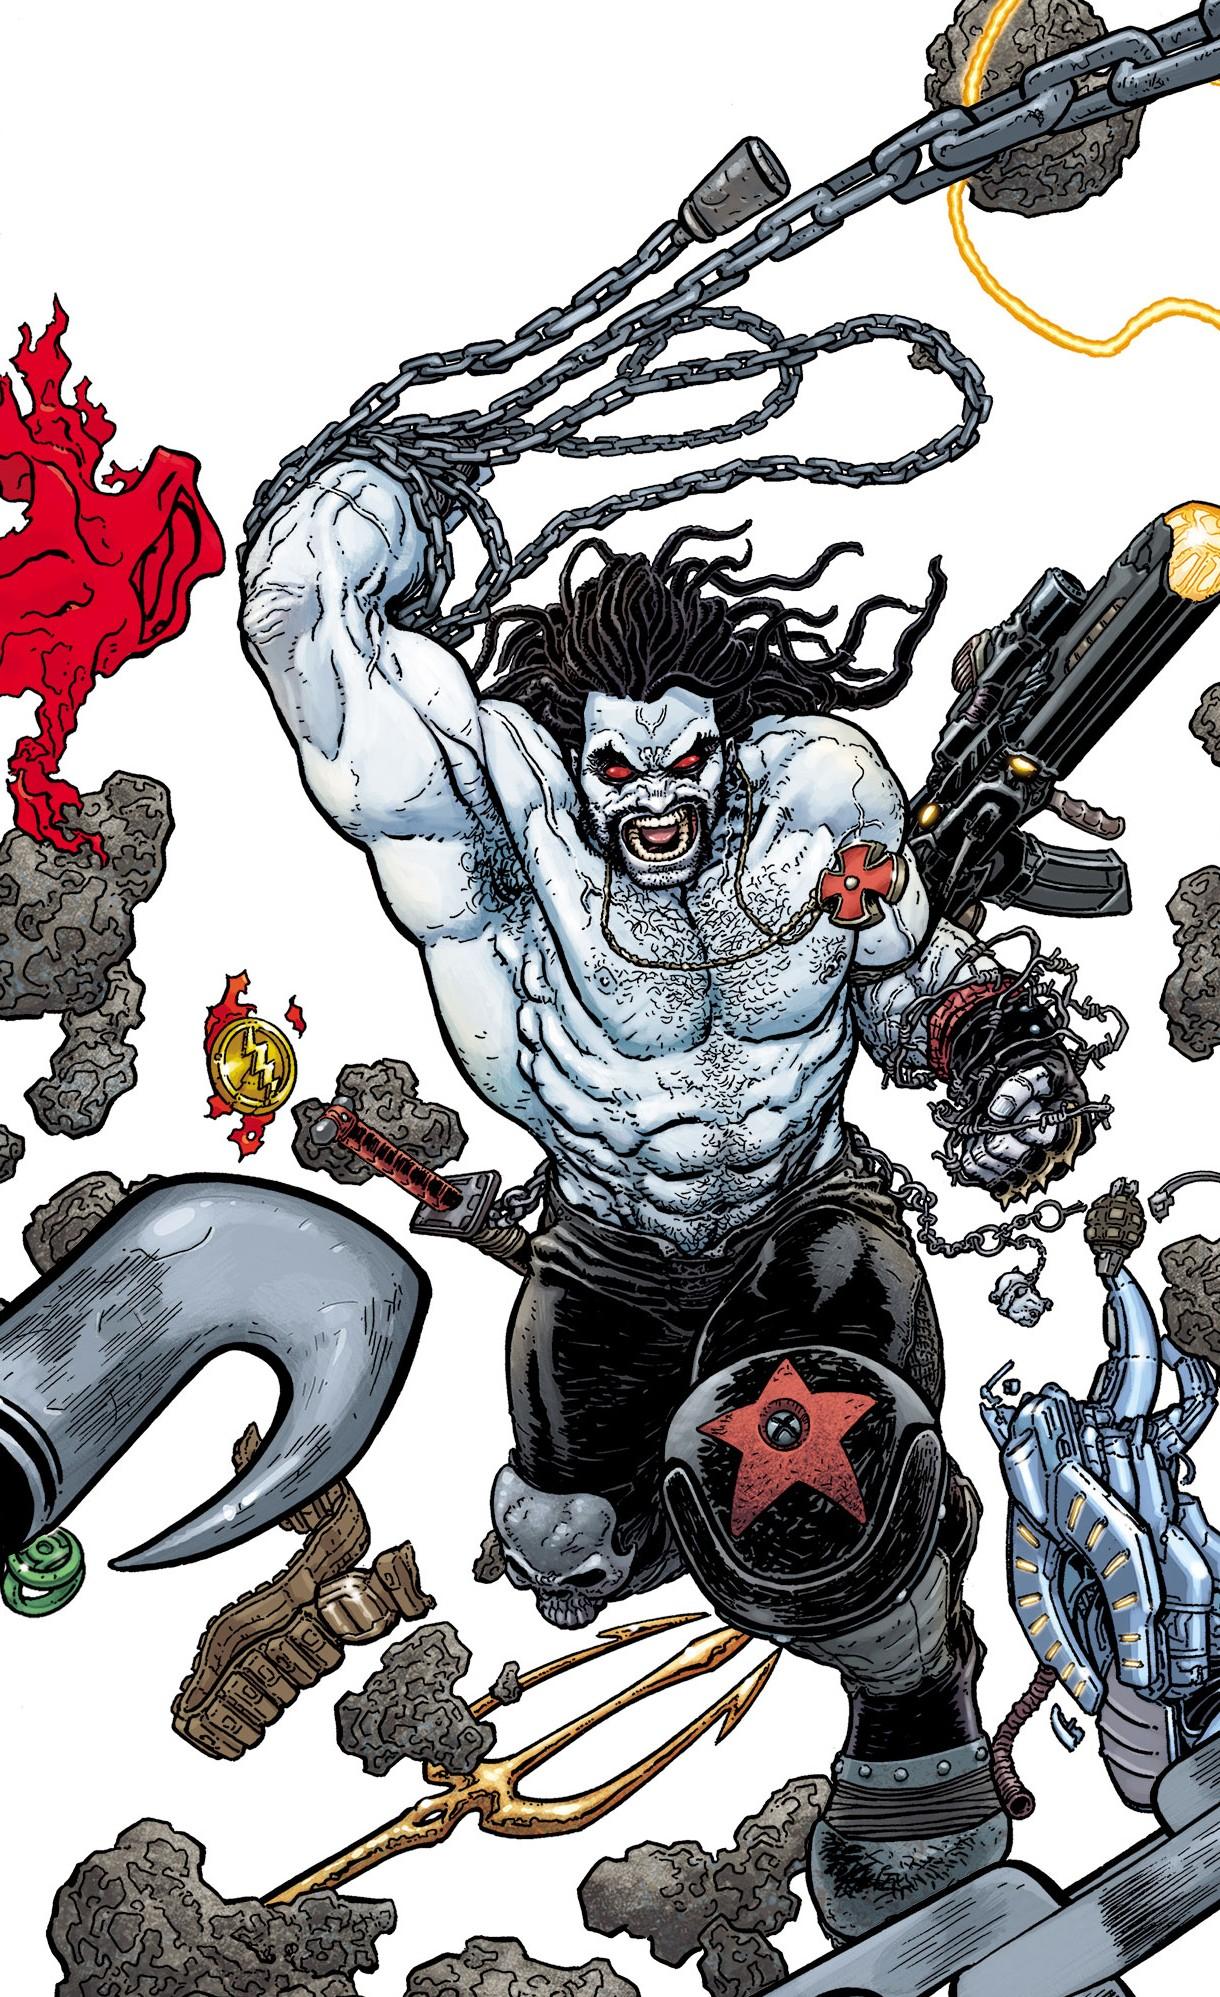 Lobo Kills the DC Universe | DC Comics Fanfiction Wikia